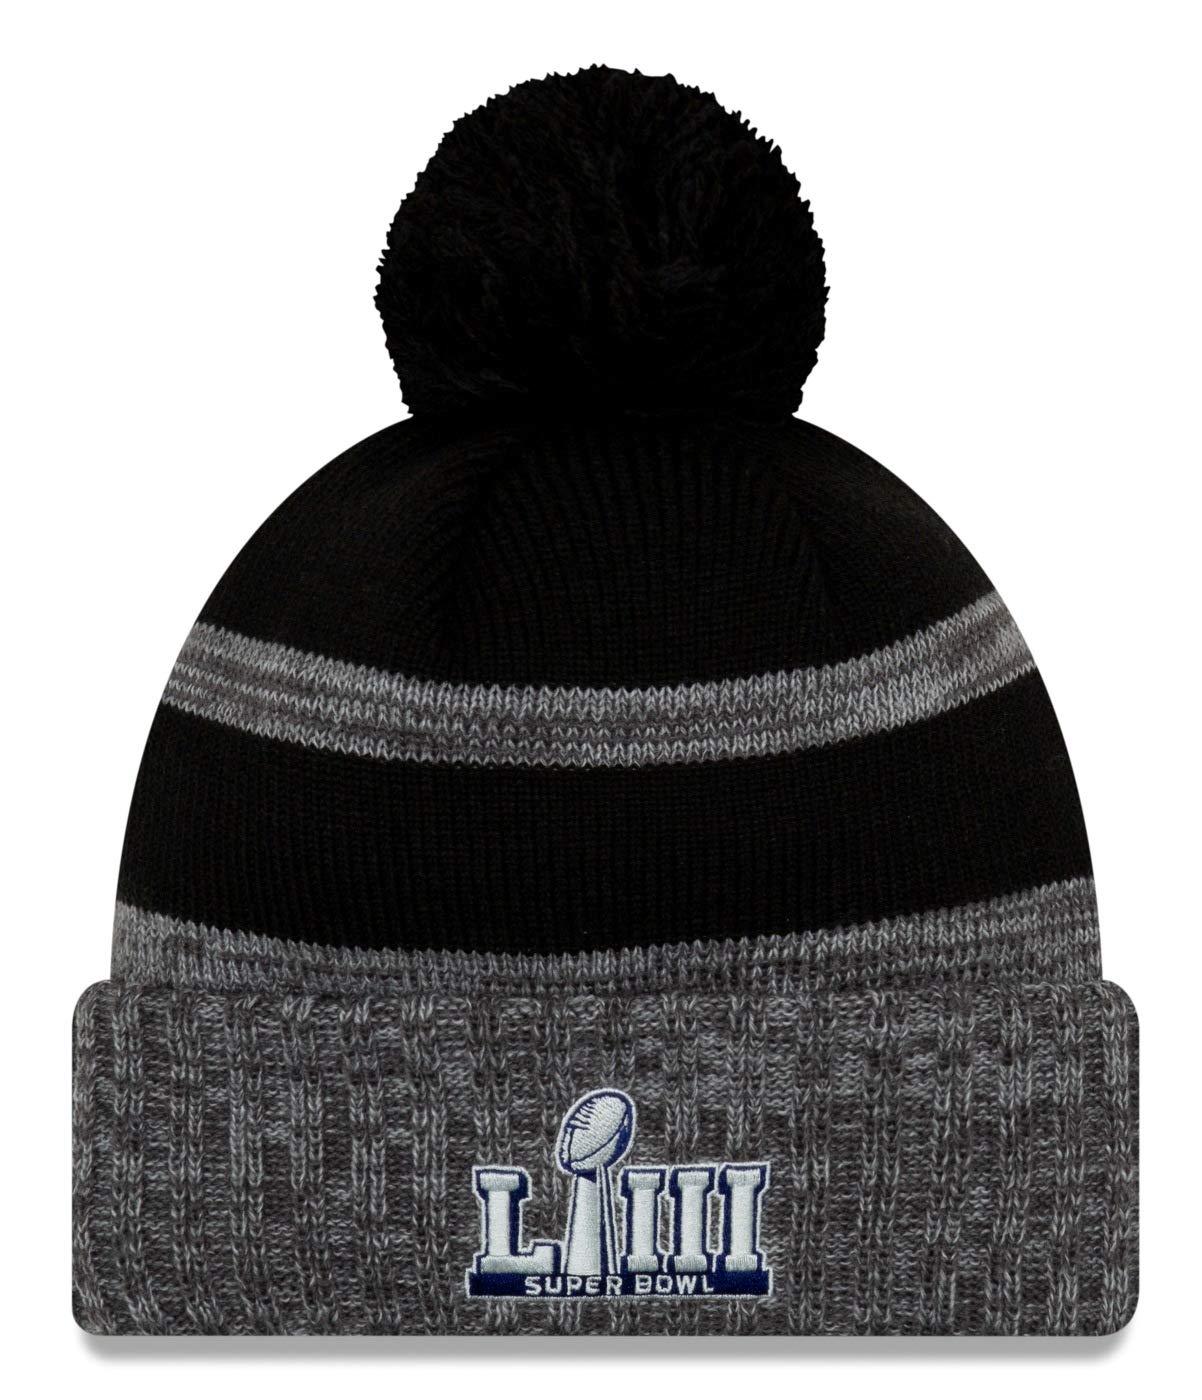 9bc7aaa76 Amazon.com   New Era New England Patriots Super Bowl LIII Champions Parade Knit  Hat - Heather Charcoal   Sports   Outdoors